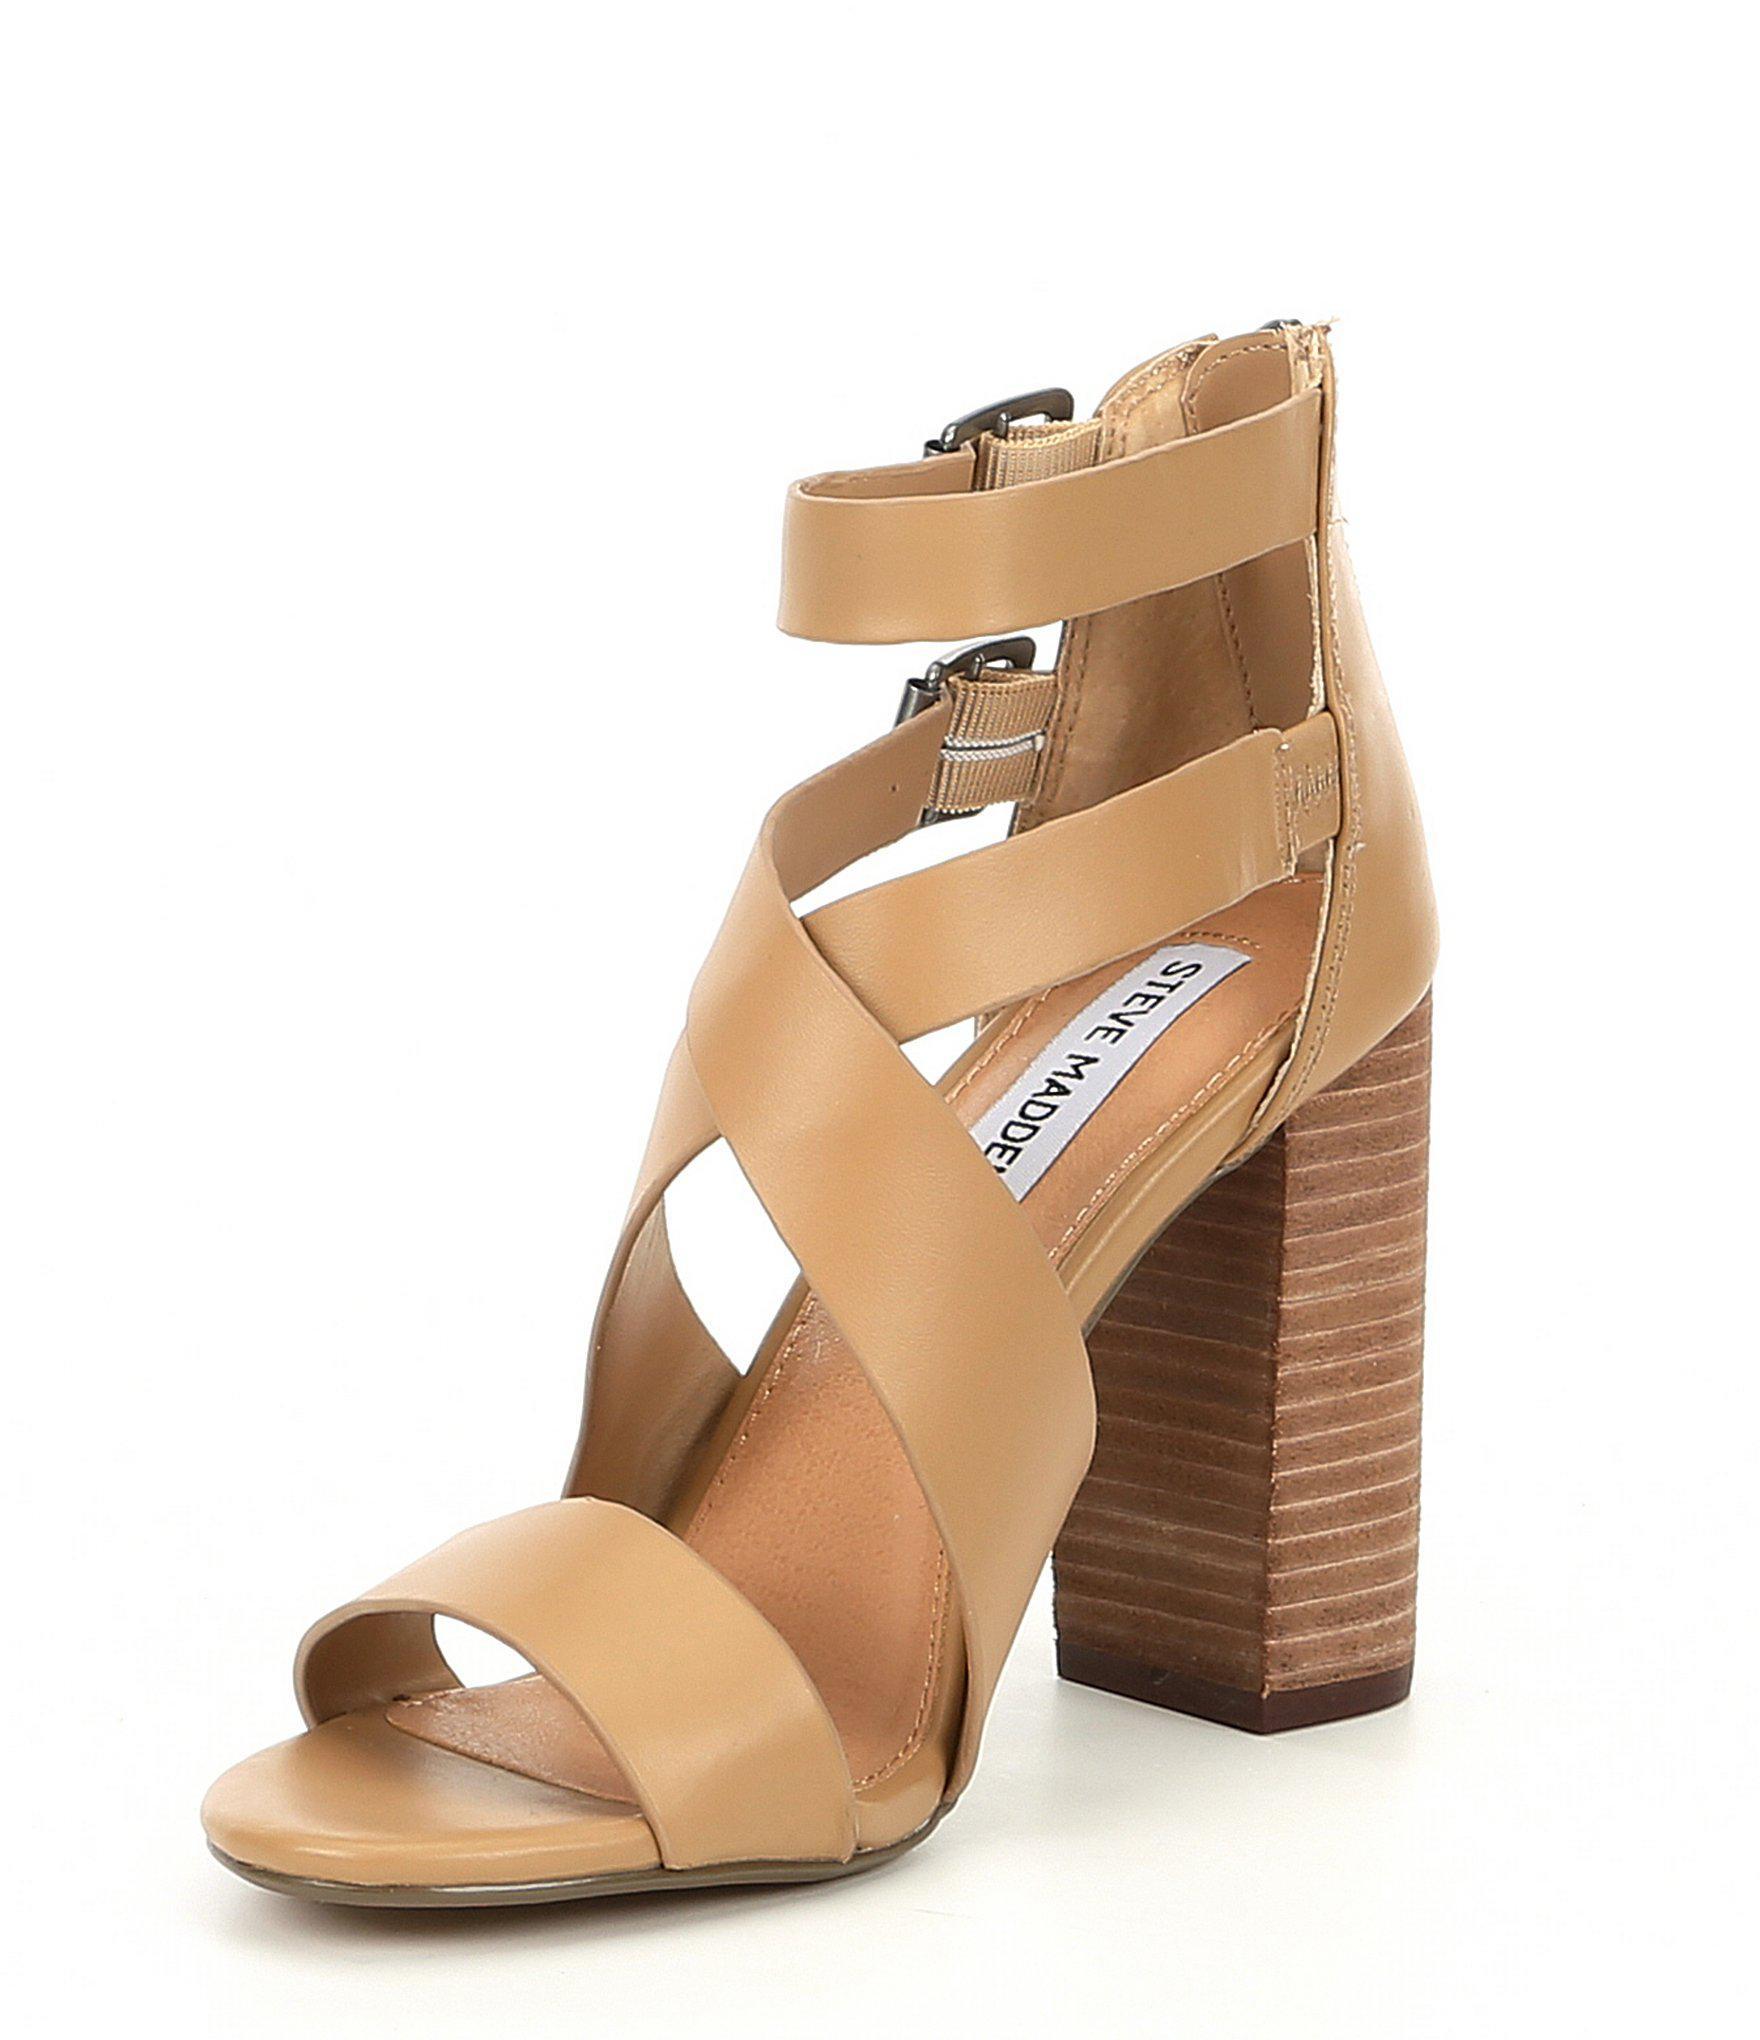 4a40136aa3e Lyst - Steve Madden Sundance Strappy Leather Block Heel Sandals